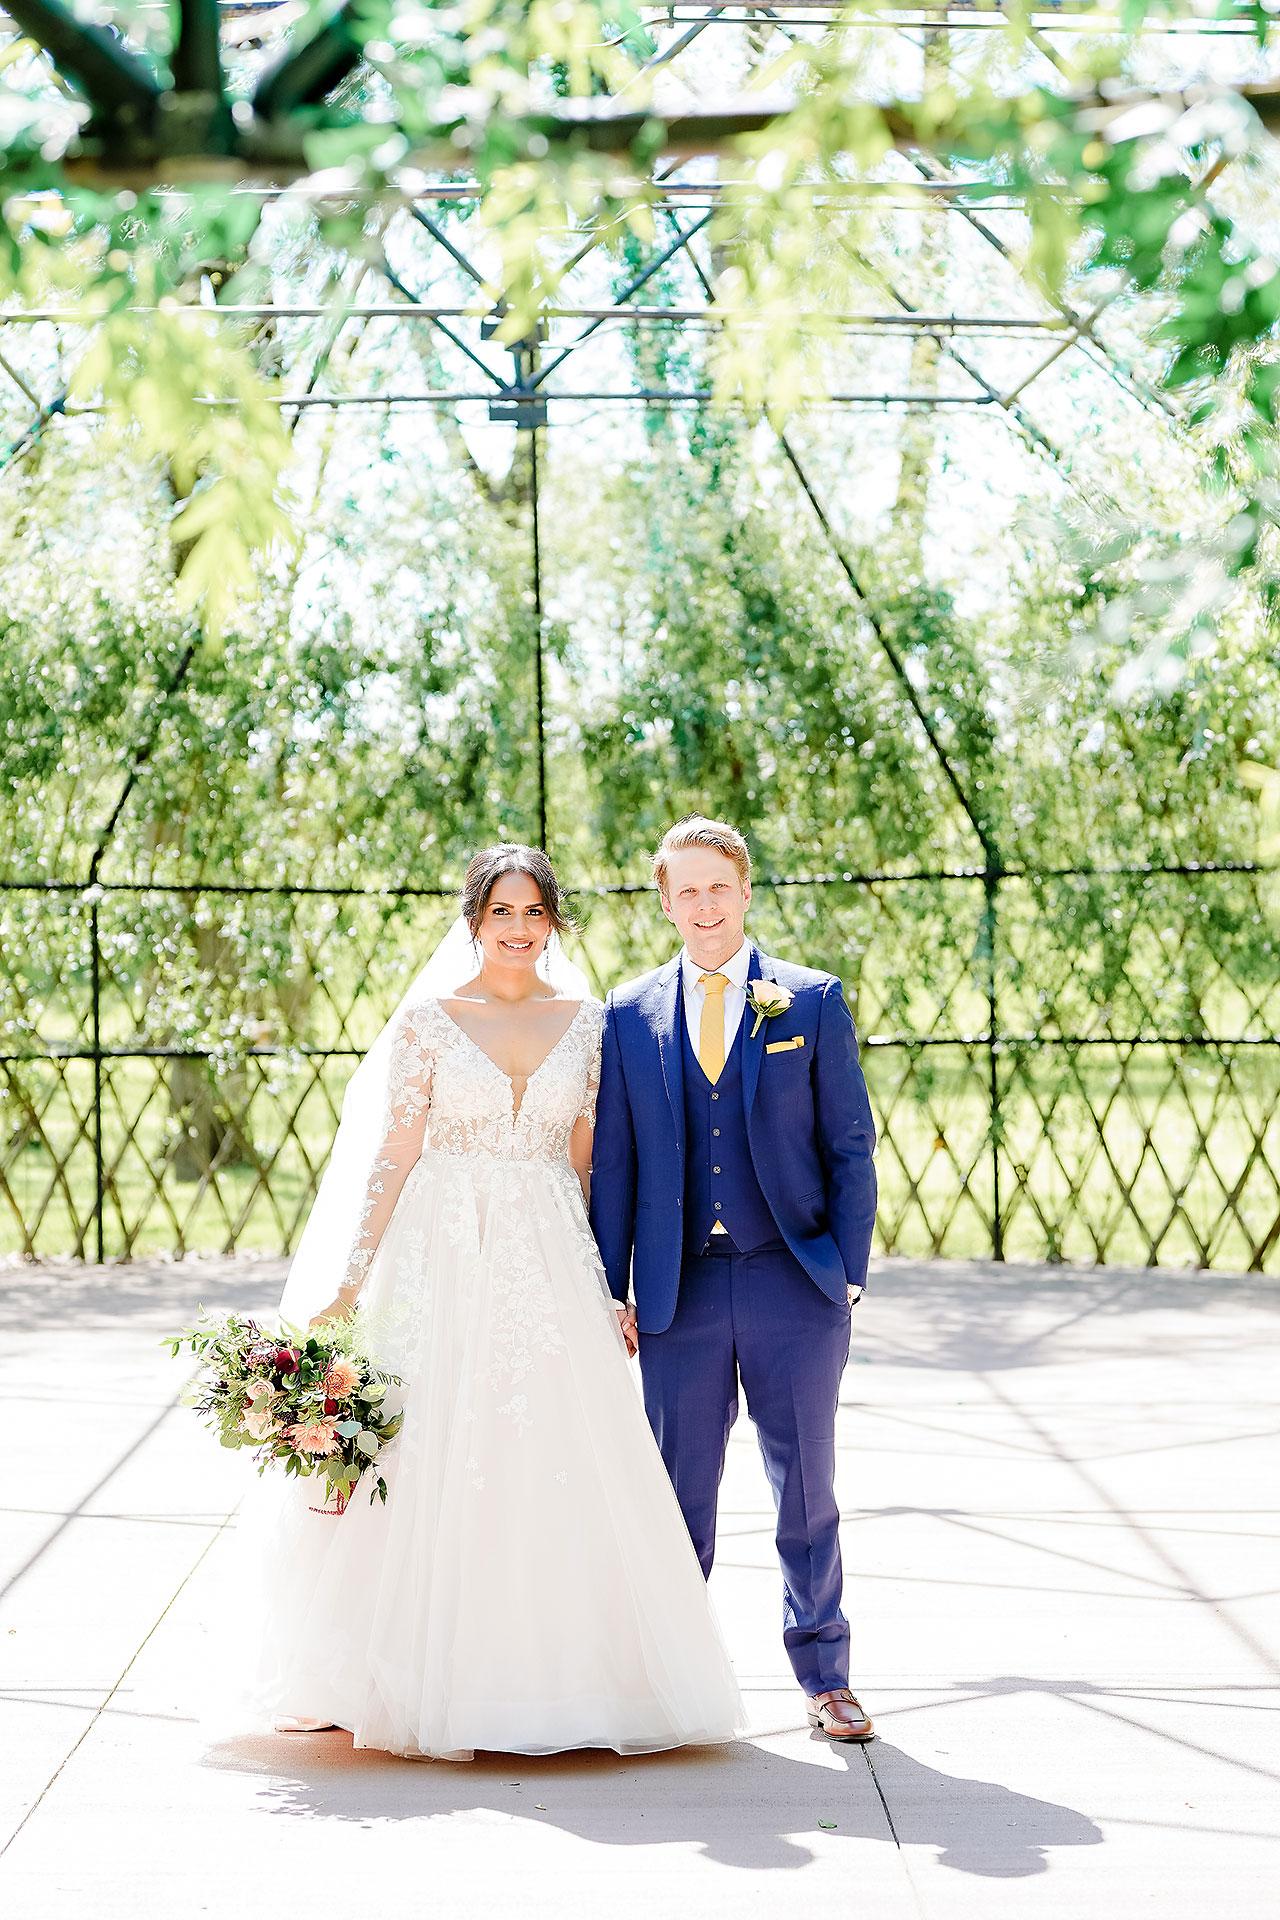 Nadia Parker Black Iris Estate Carmel Indiana Wedding May 2021 103